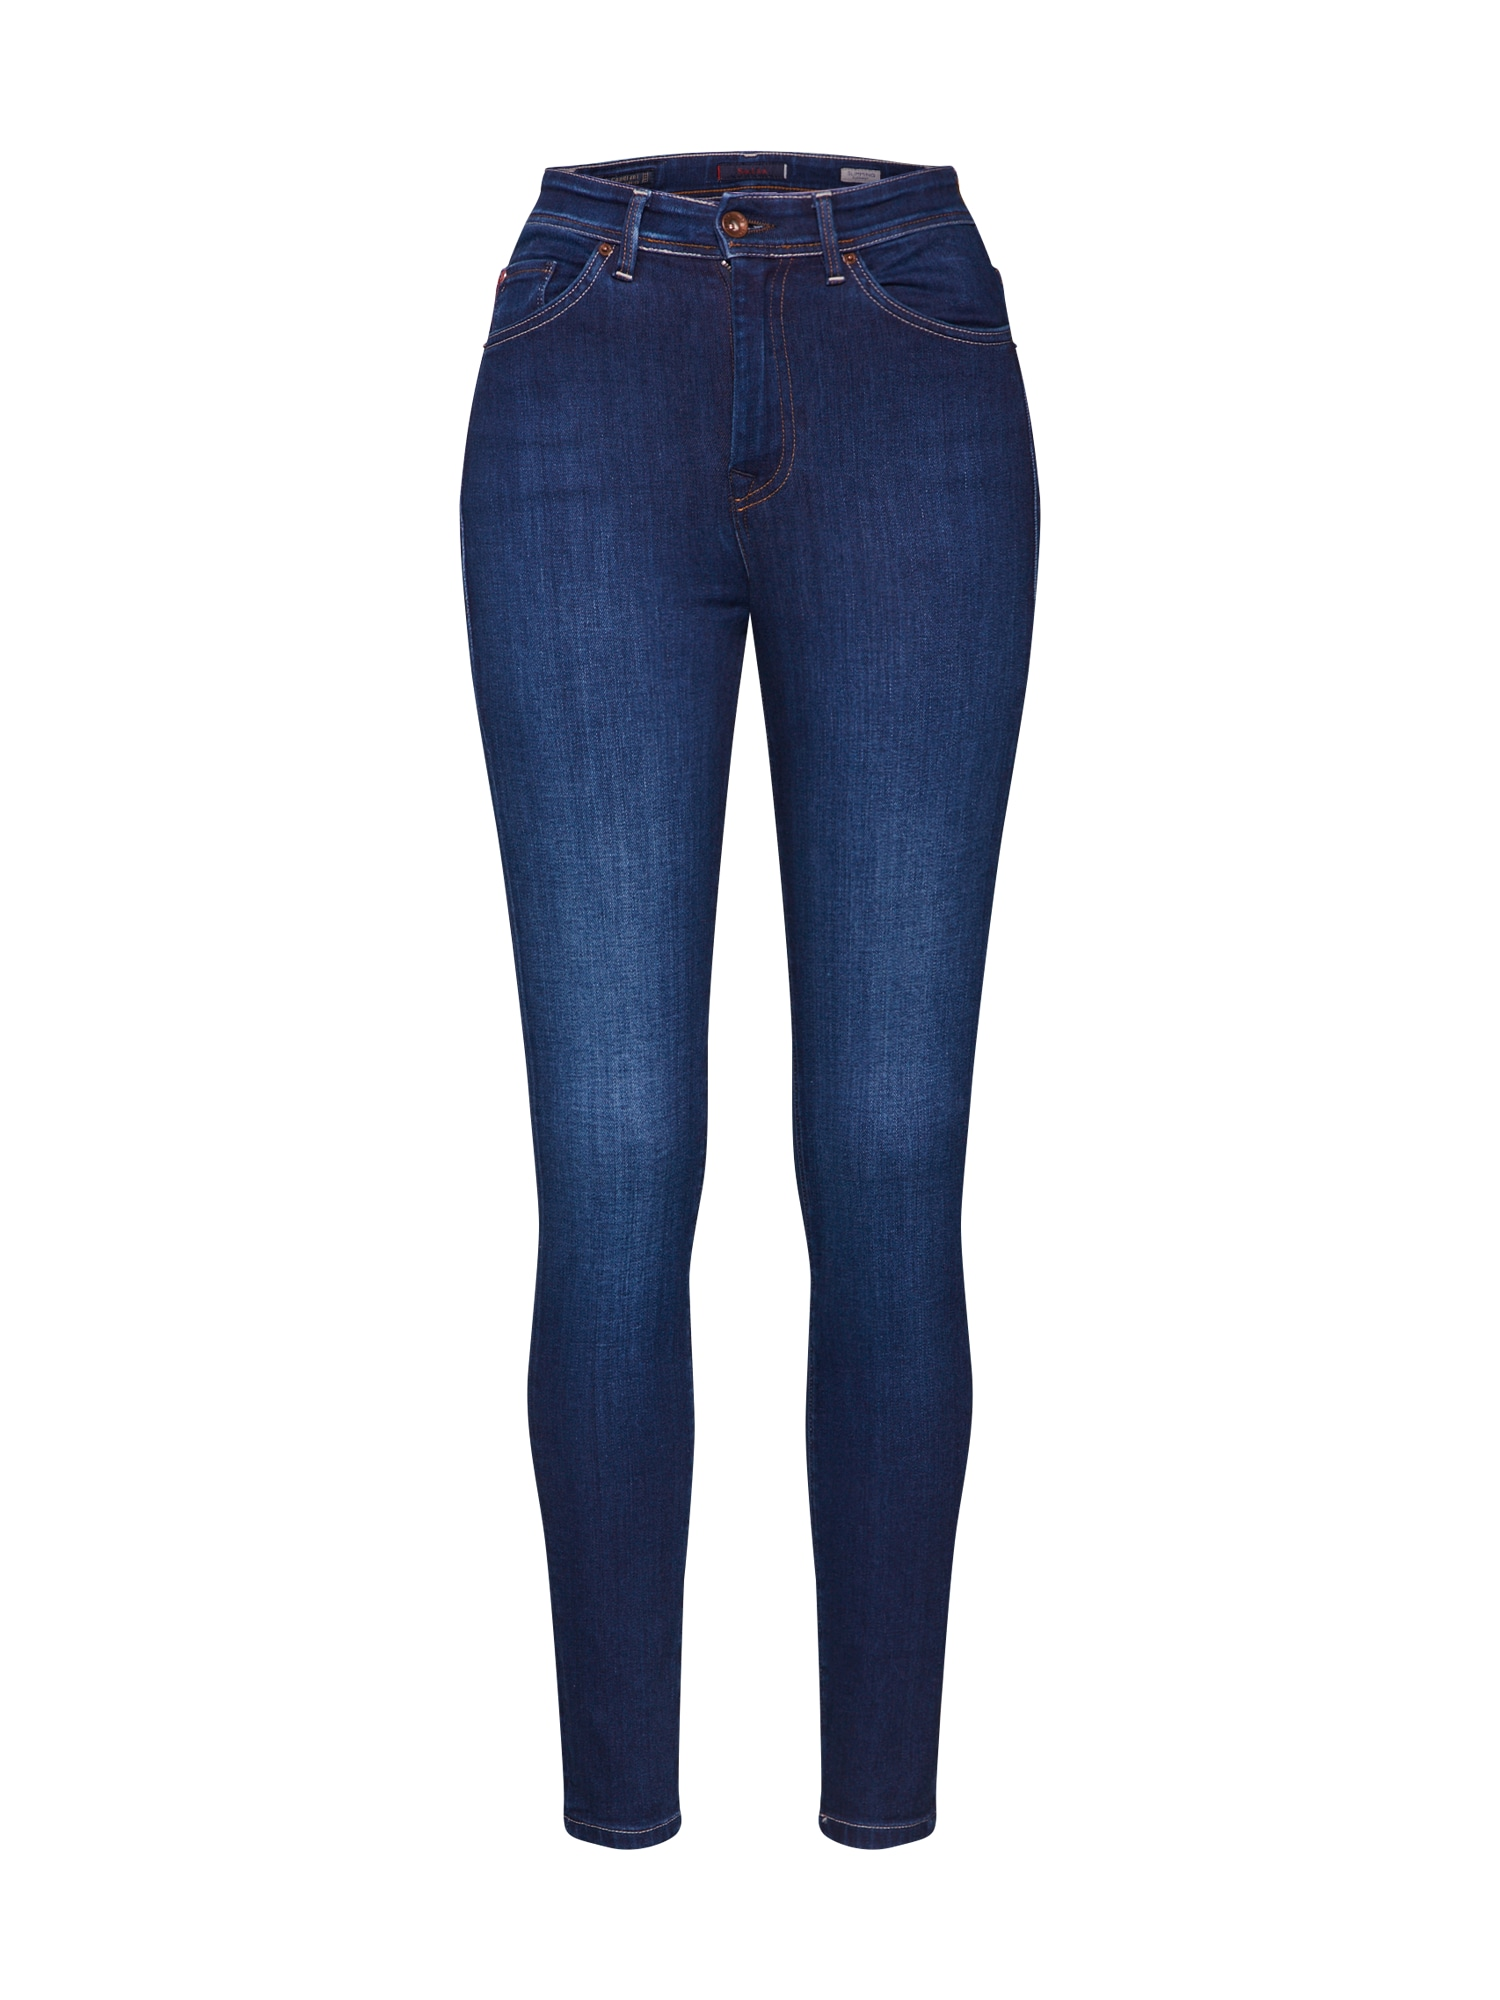 Salsa Džinsai tamsiai (džinso) mėlyna